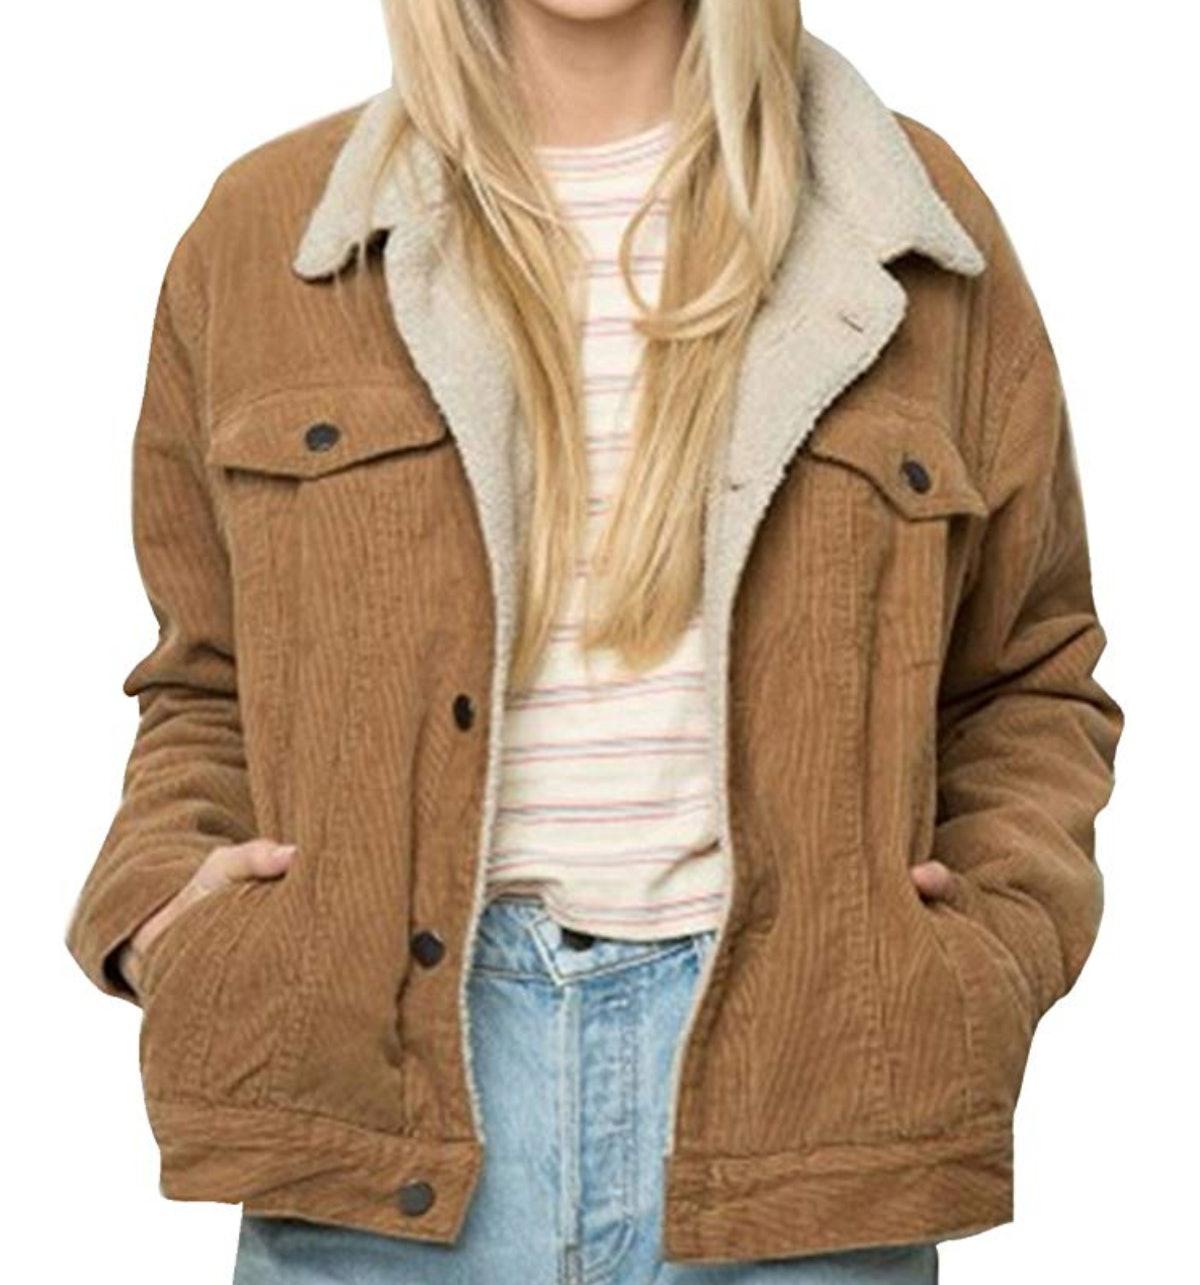 HAOYIHUI Womens Casual Solid Long Sleeve Single Breasted Faux Fur Collar Jacket